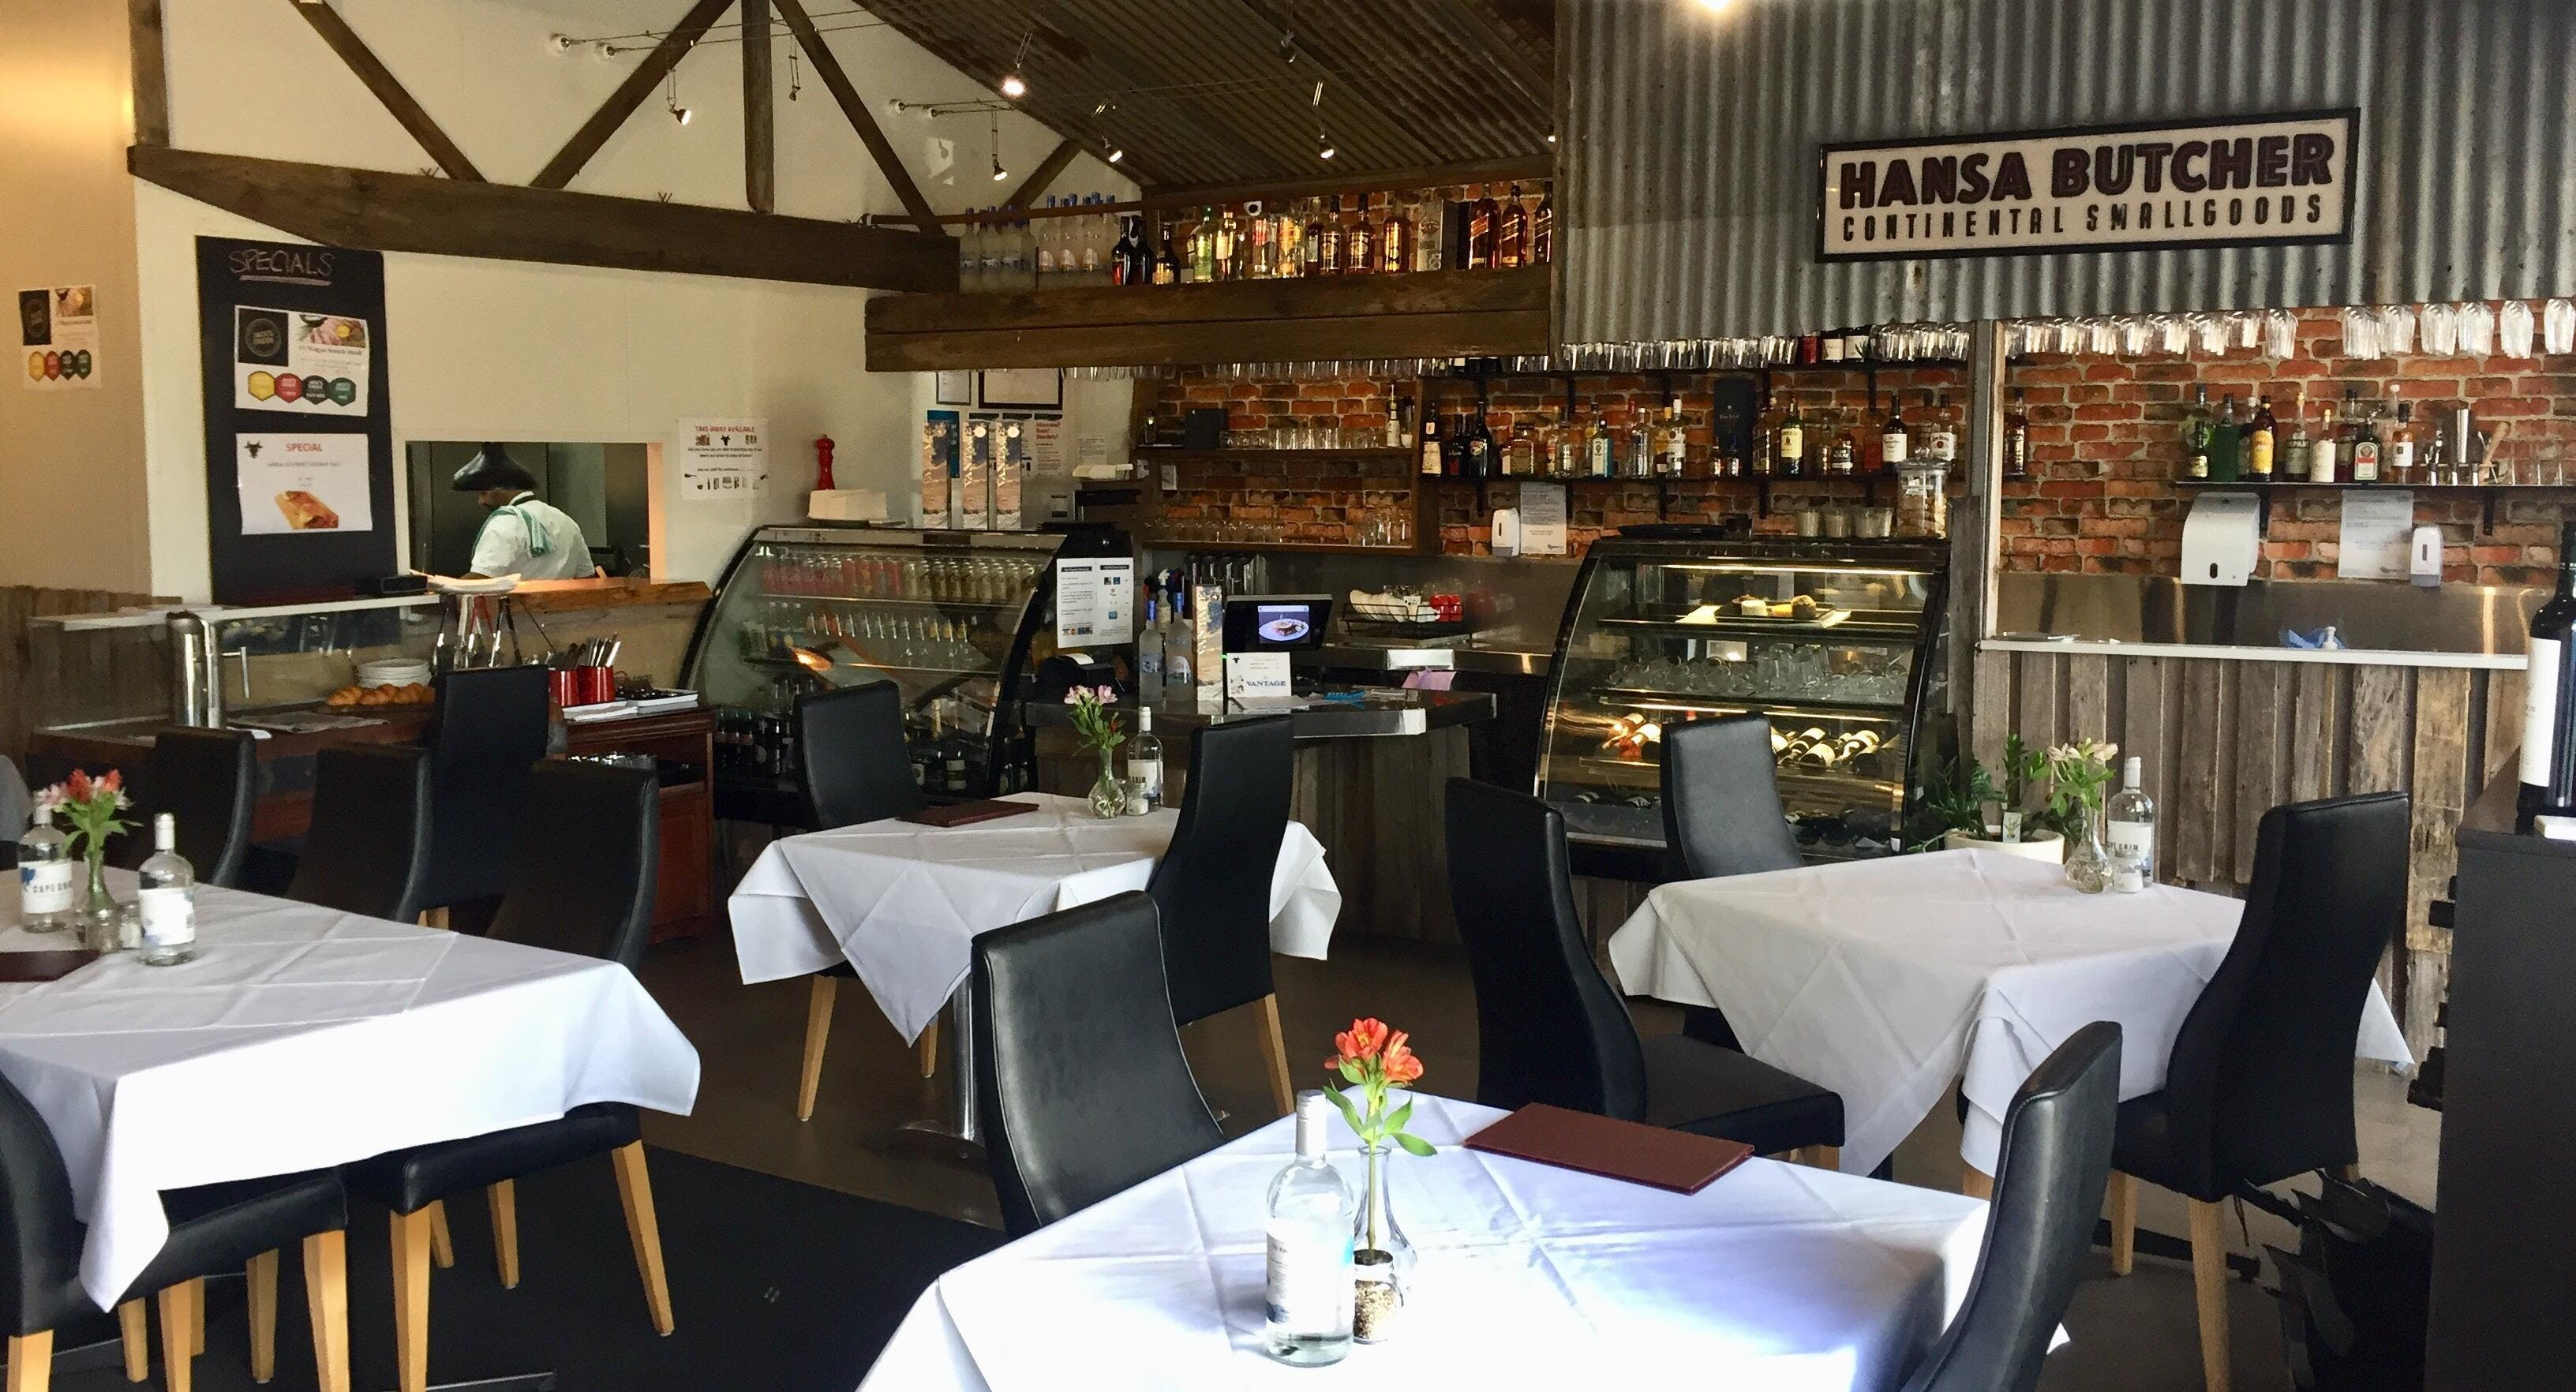 Hansa's Steak & Grill Melbourne image 1